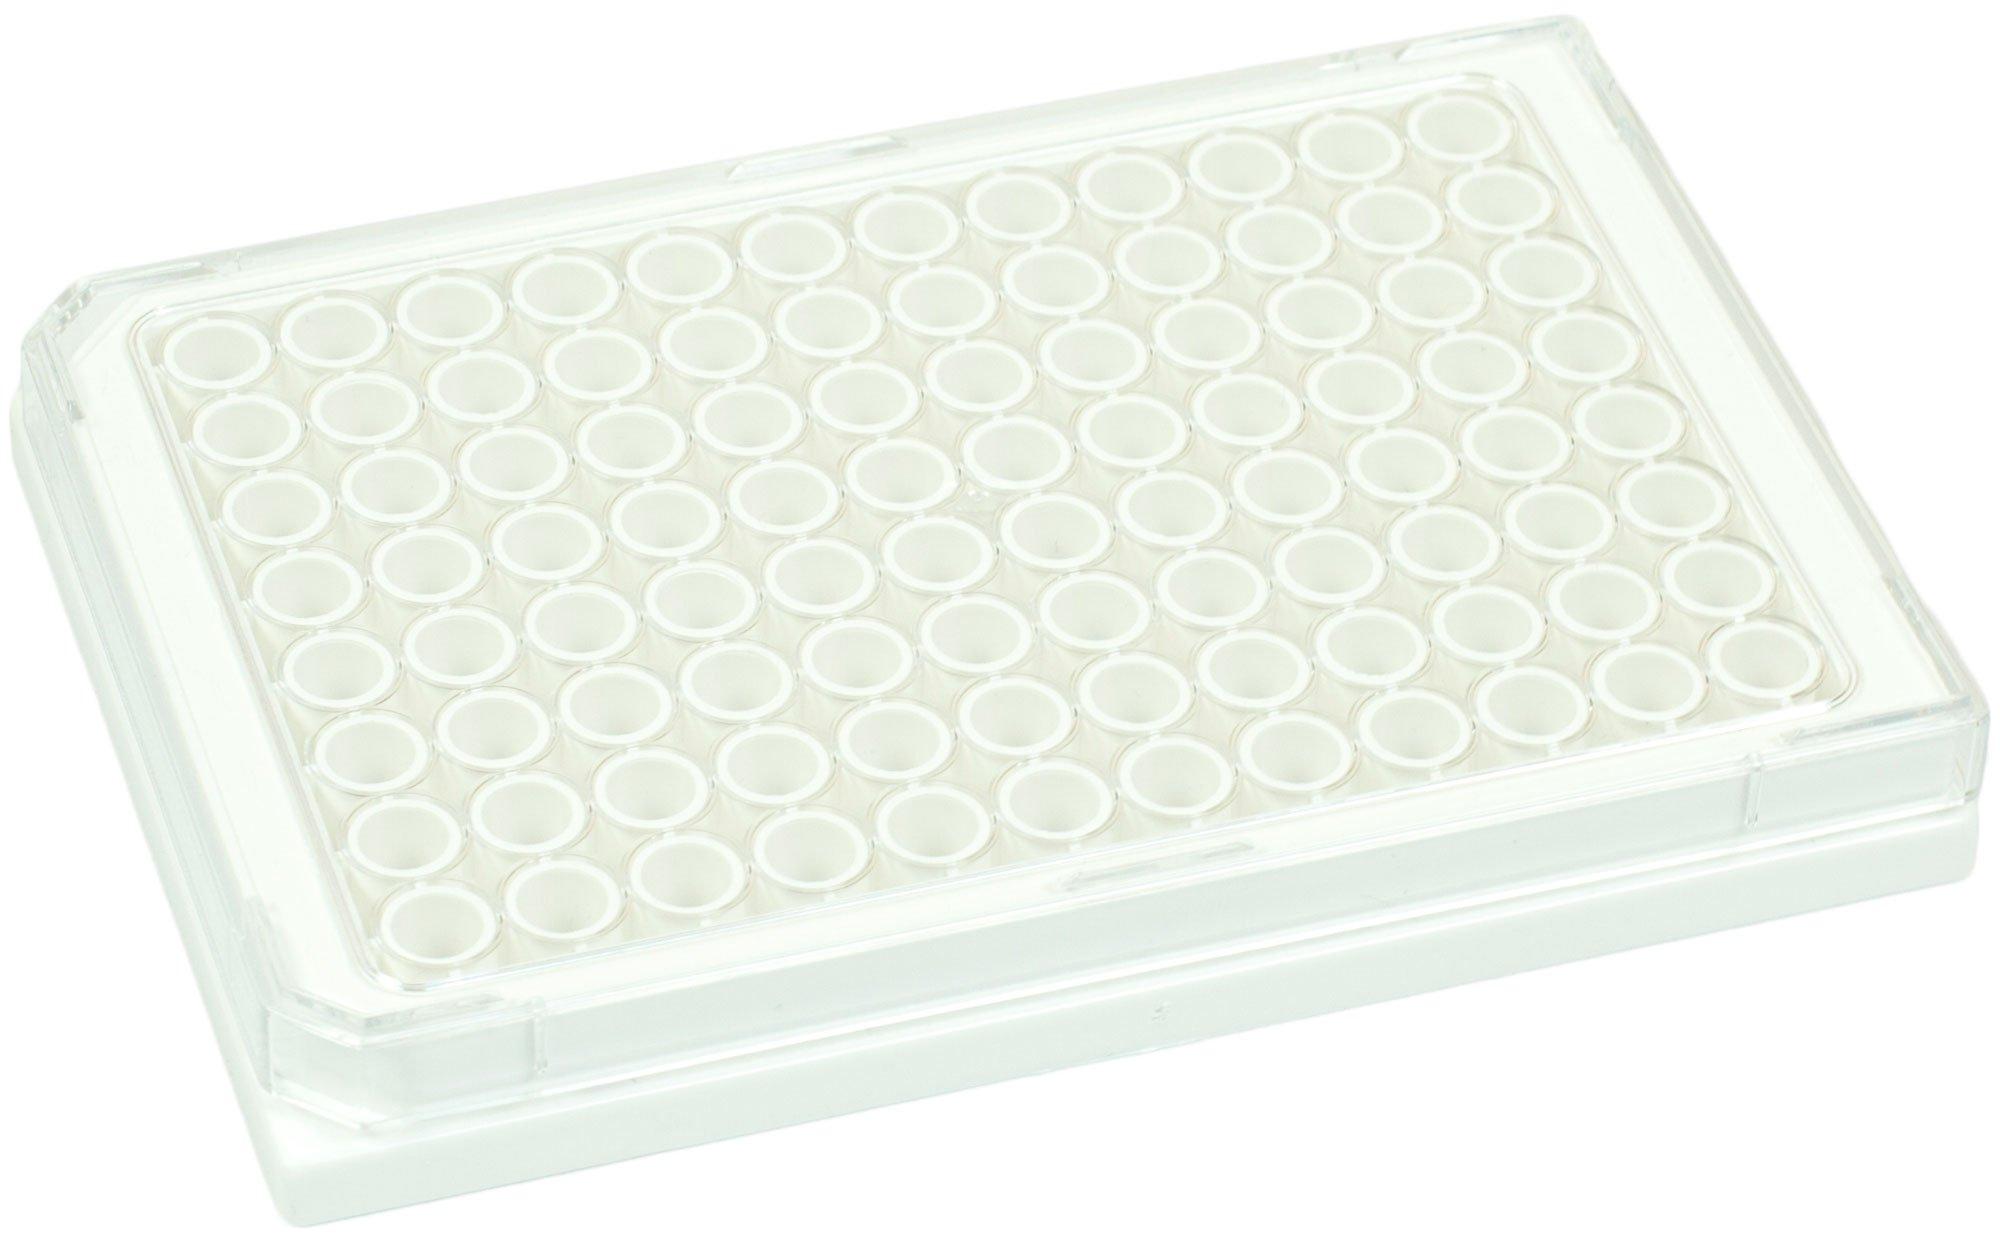 BRANDplates cellGrade Treated Sterile Surface 96-Well Plate - White, Transparent F-Bottom